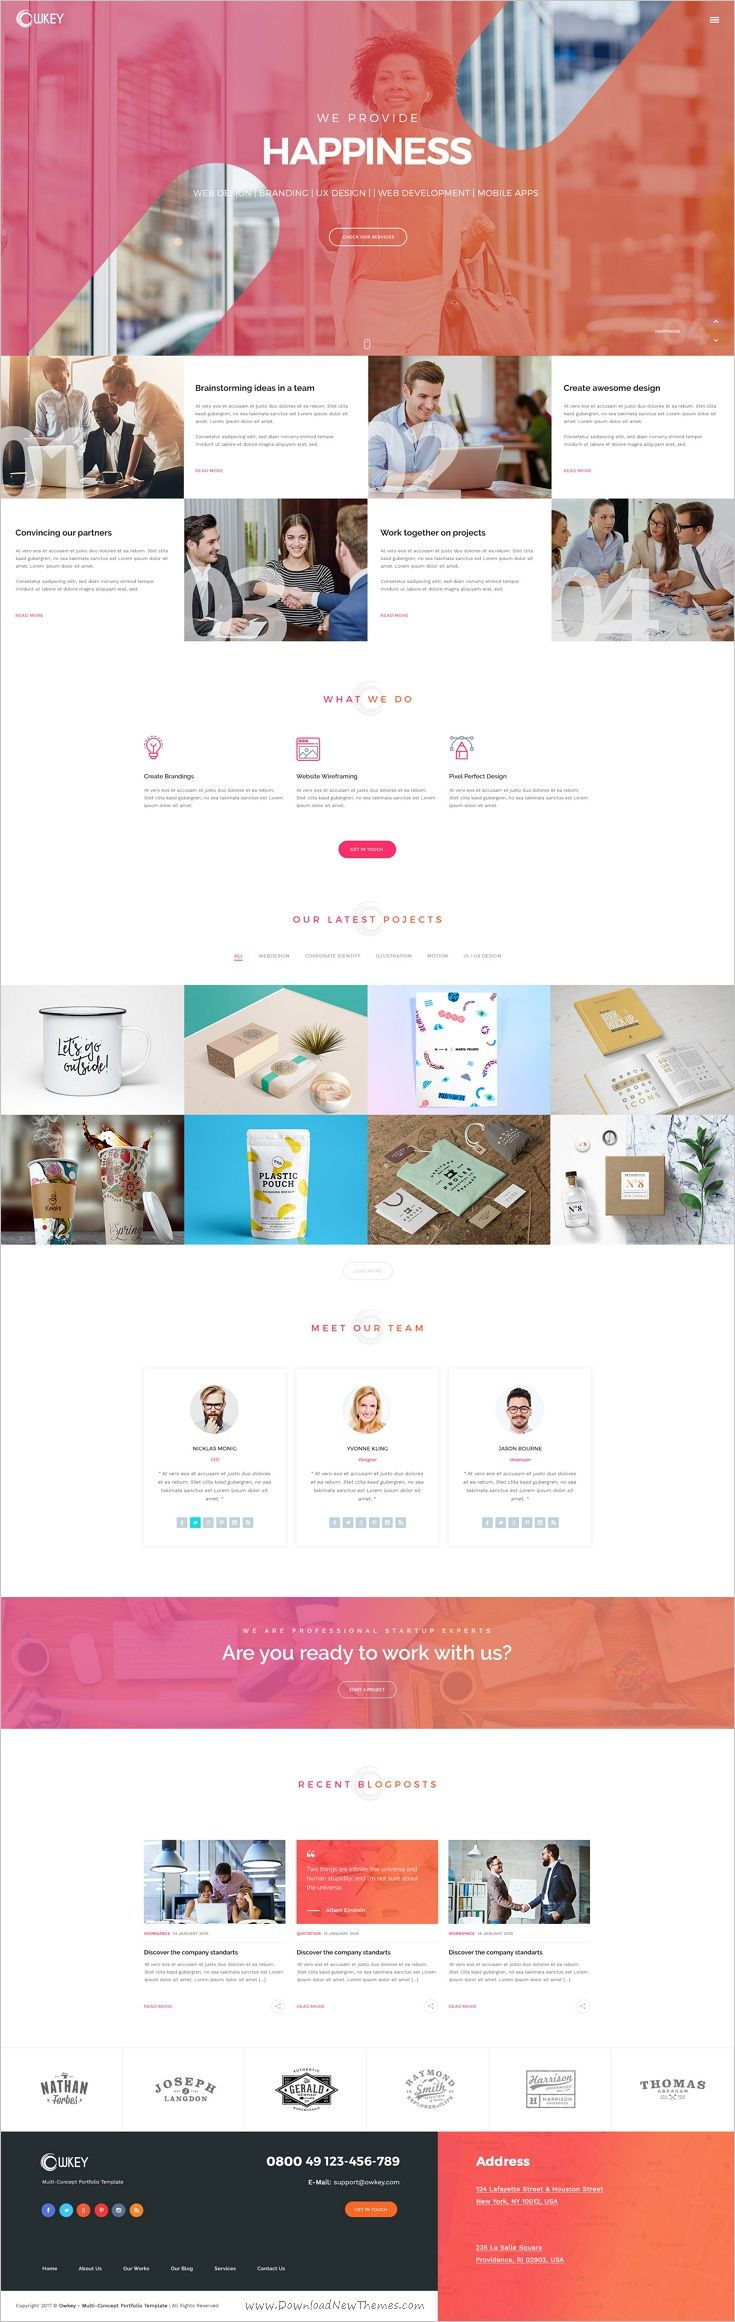 Pin By Prasetya Kusmana On Website Design Inspiration Website Design Web Design User Interface Creative Wordpress Themes